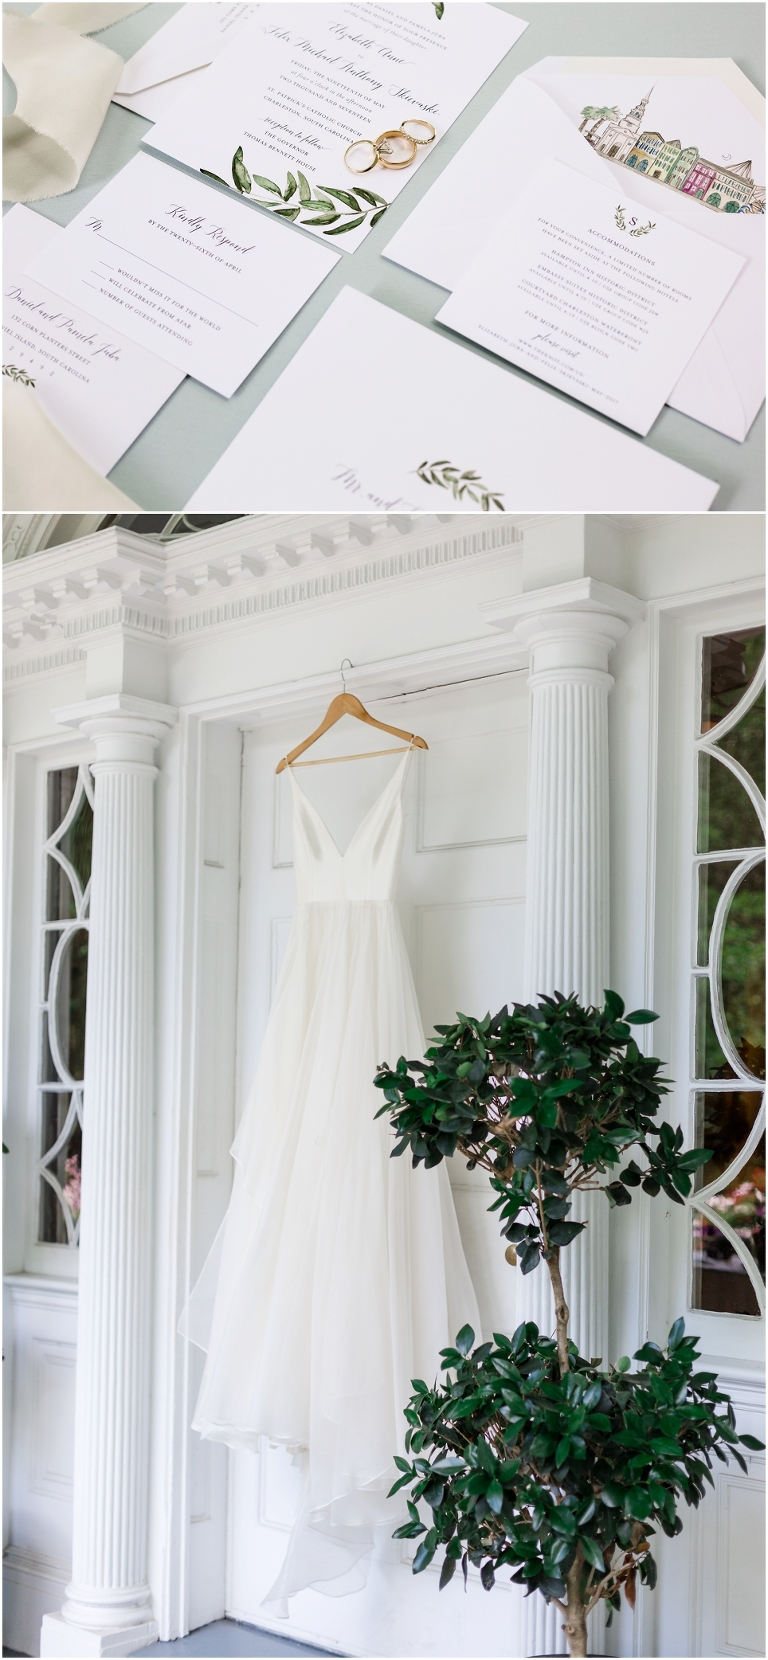 Thomas bennett house Wedding in Charleston